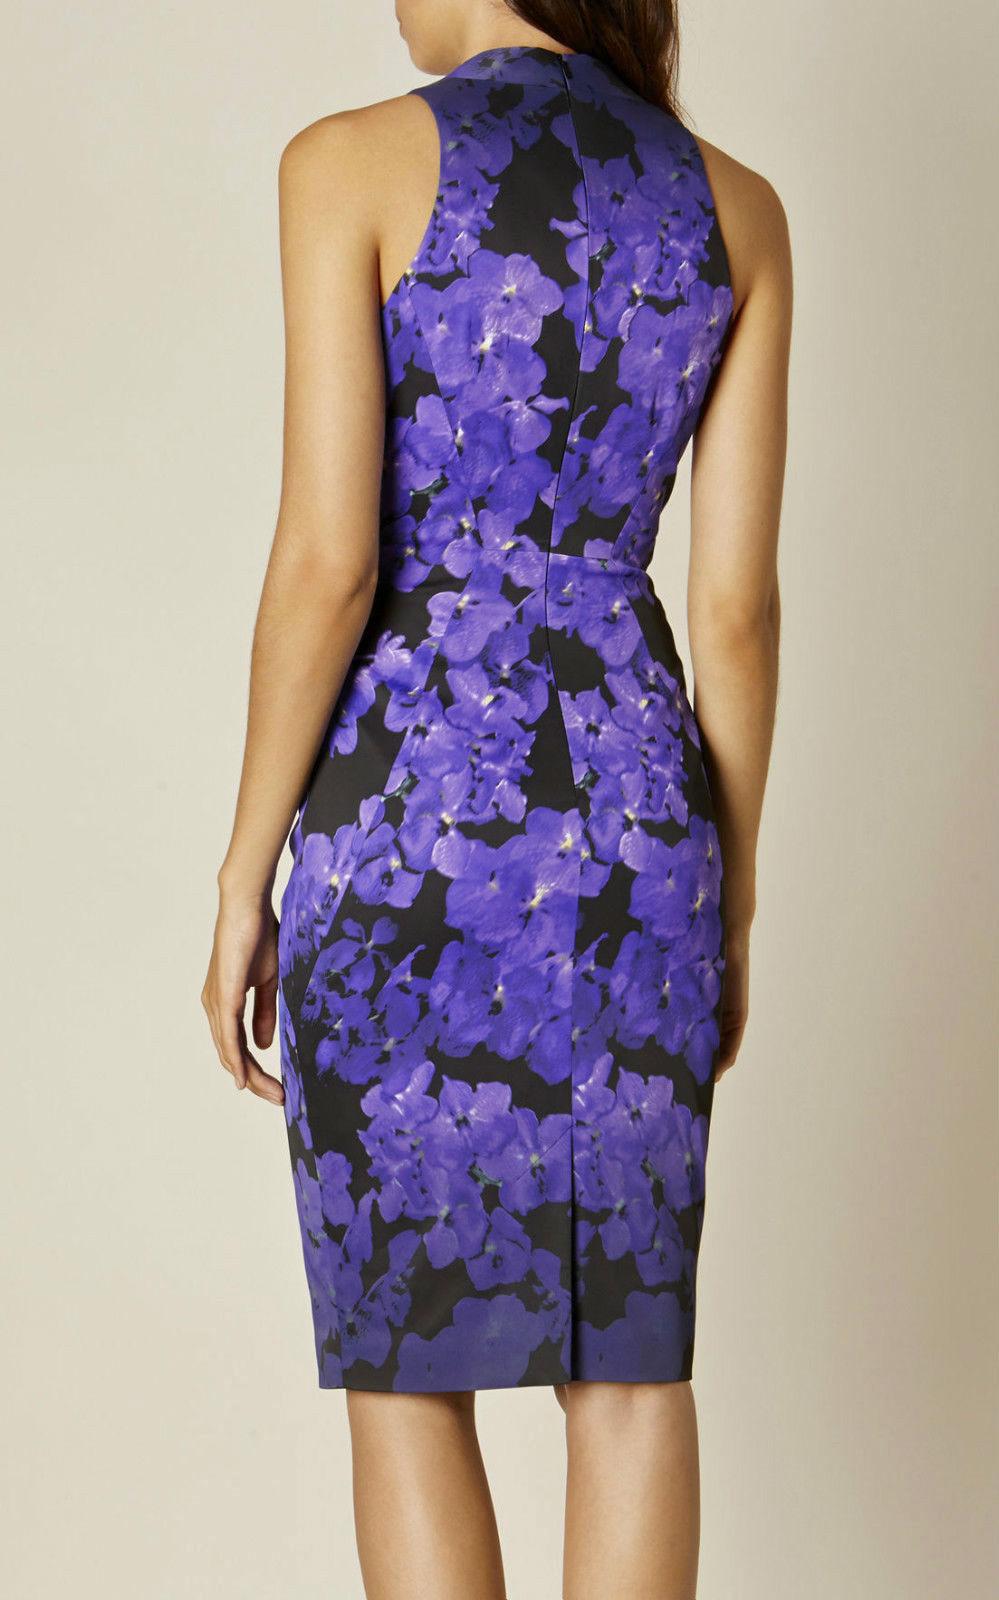 DZ163 Karen Millen Floral Print Satin Dress Purple